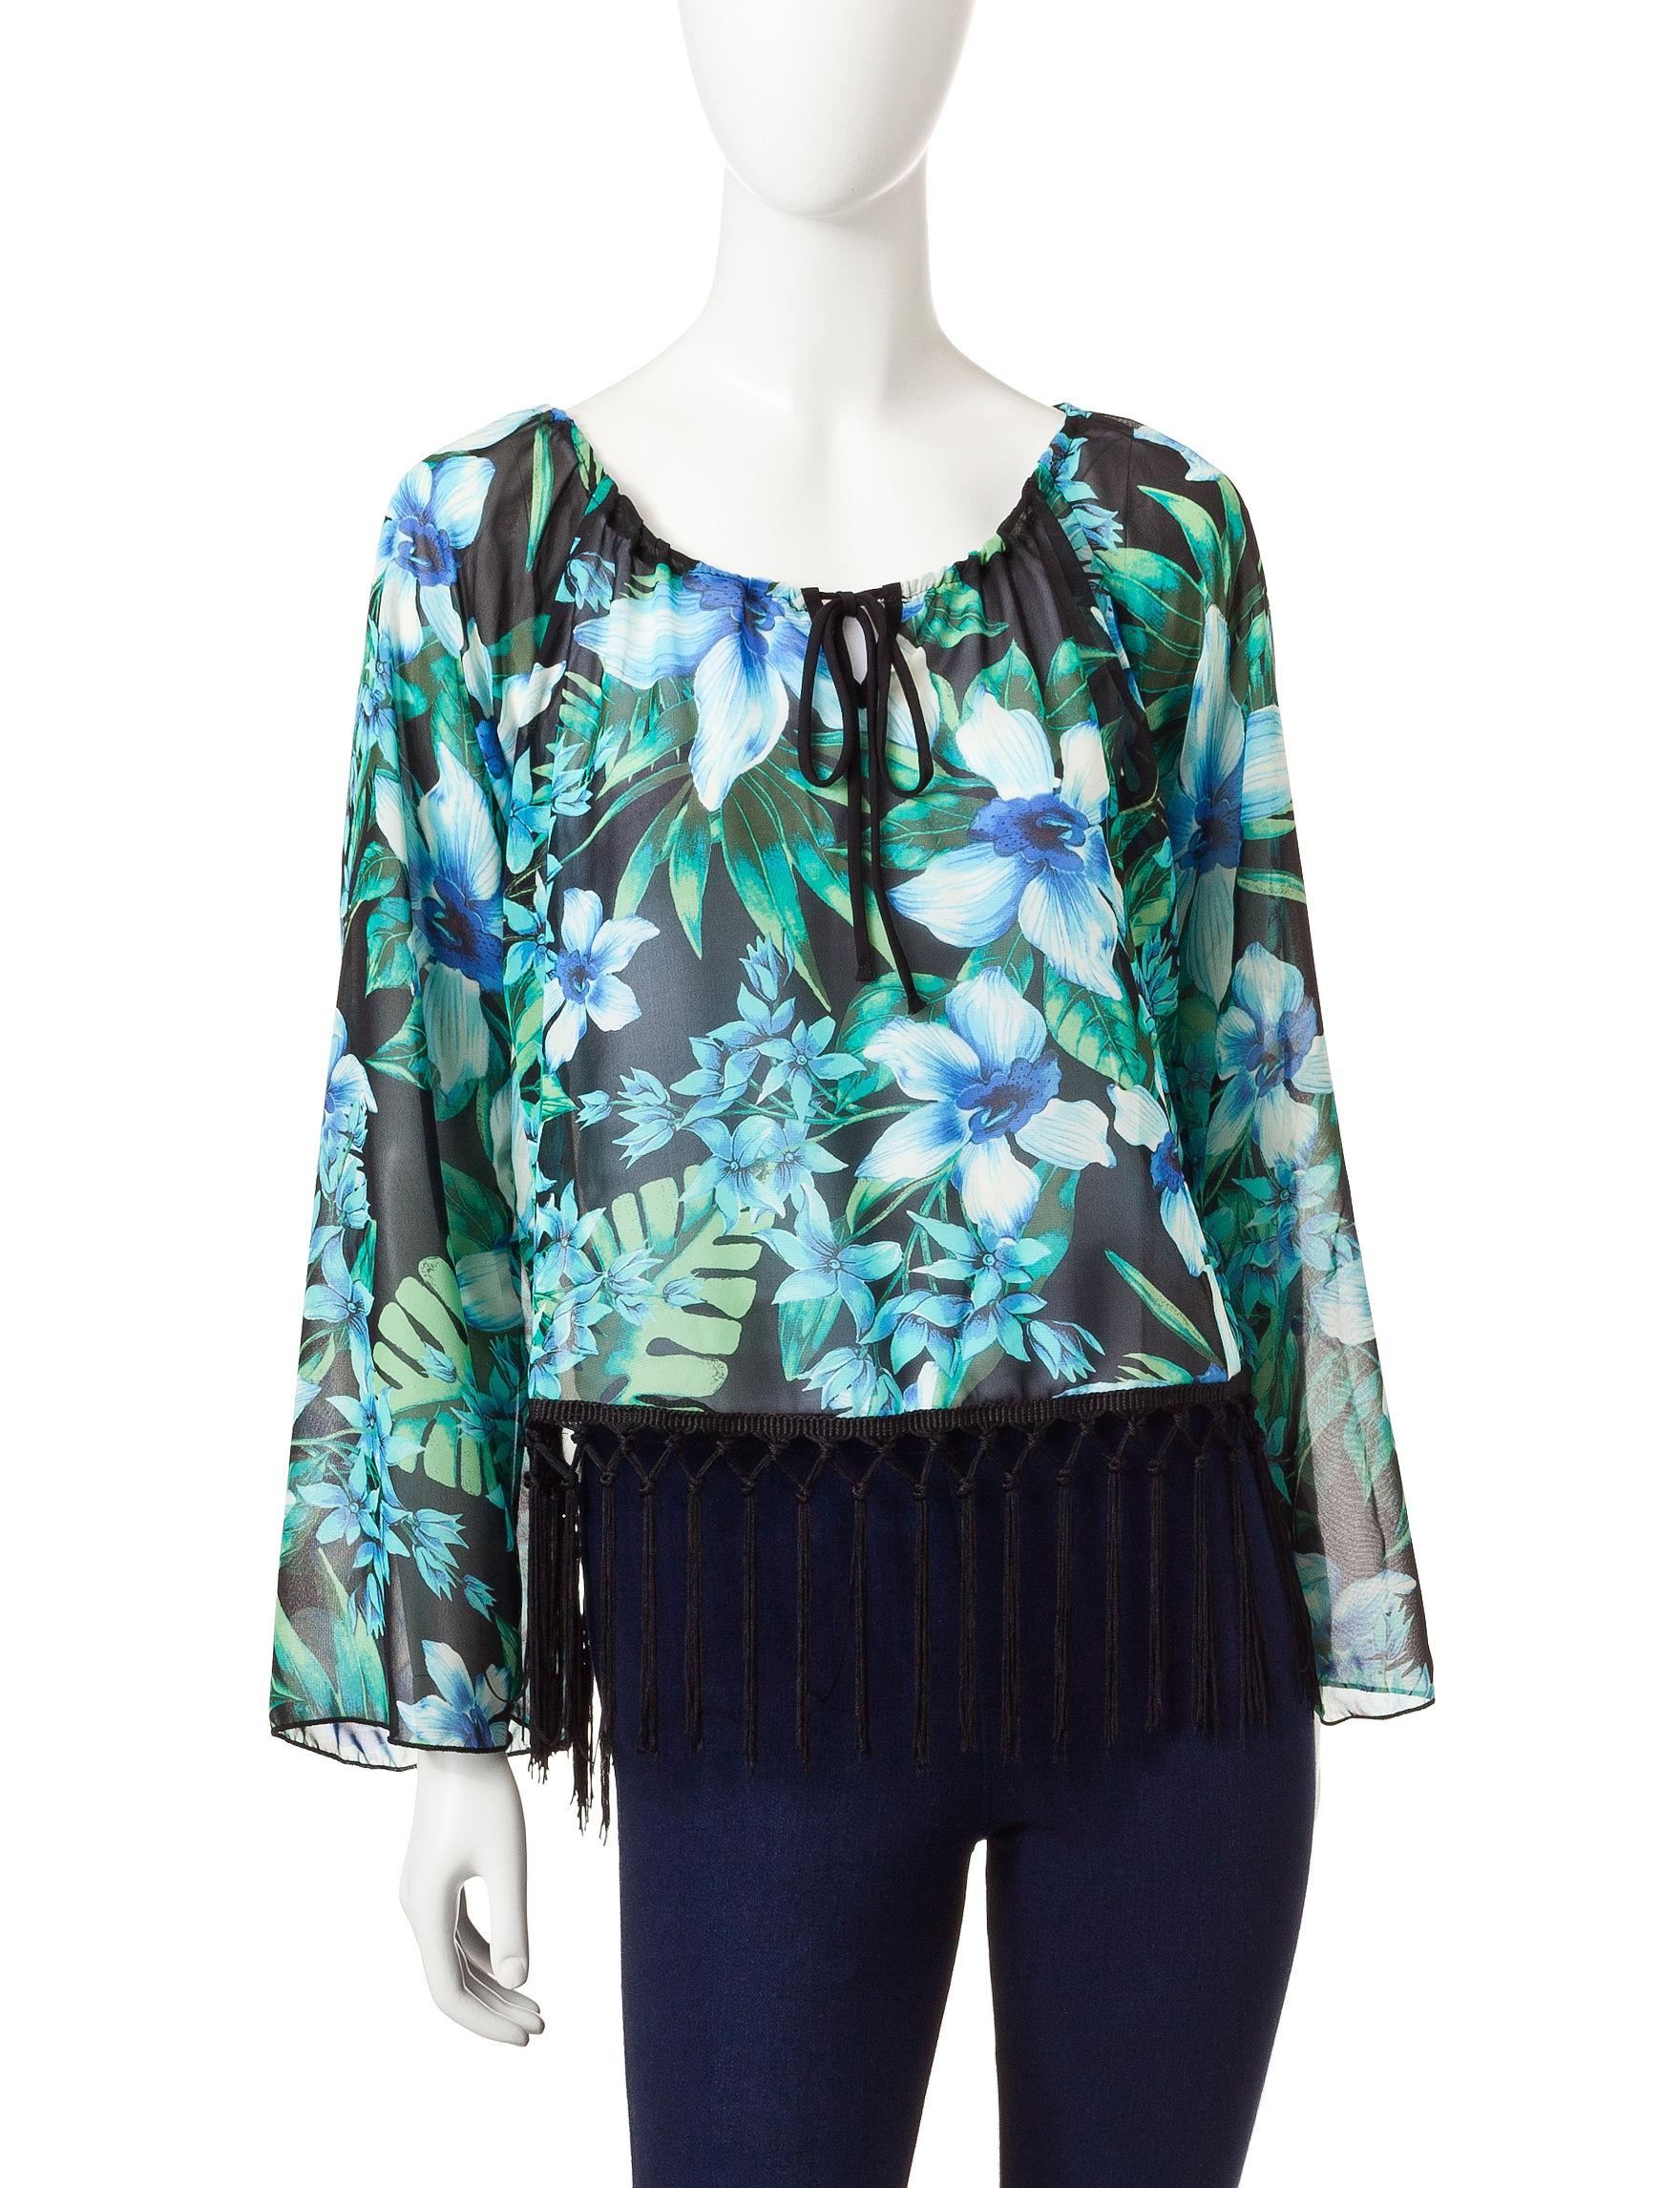 Romeo + Juliet Couture Blue Shirts & Blouses